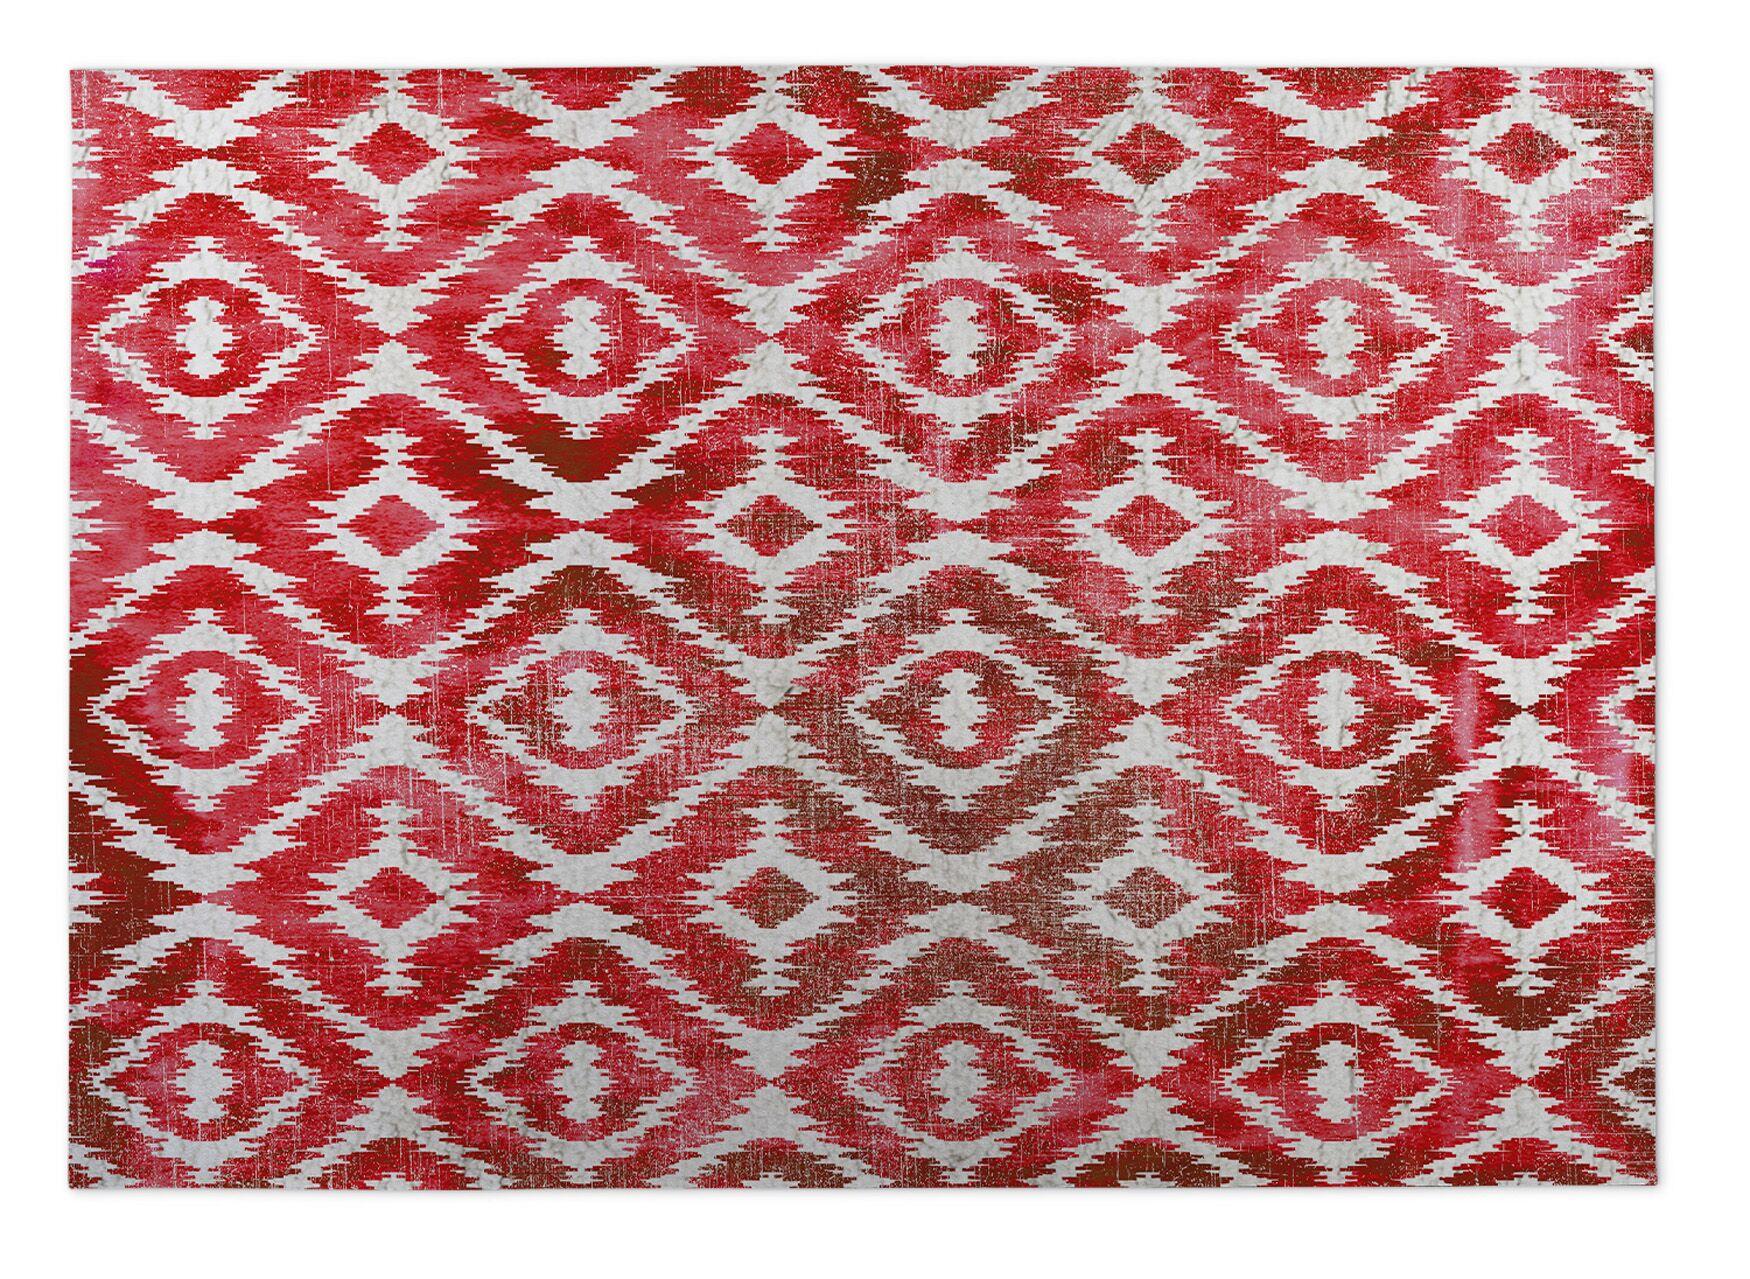 Laplant Pink Indoor/Outdoor Area Rug Rug Size: Rectangle 4' x 5'